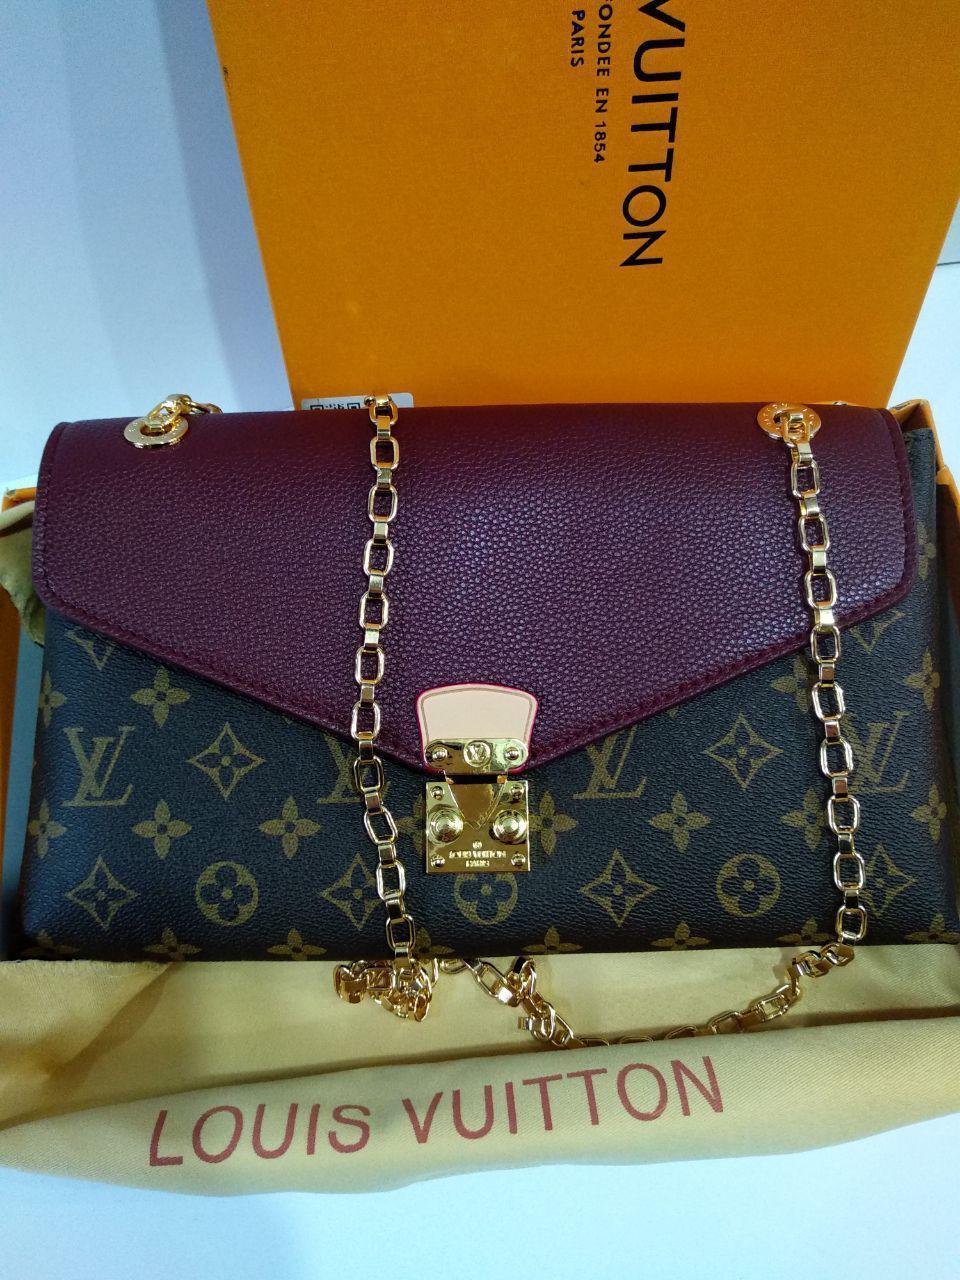 9ccf108e1336 Женская кожаная сумка в стиле Louis Vuitton Луи Виттон, цена 1 855 грн.,  купить в Киеве — Prom.ua (ID#869191568)